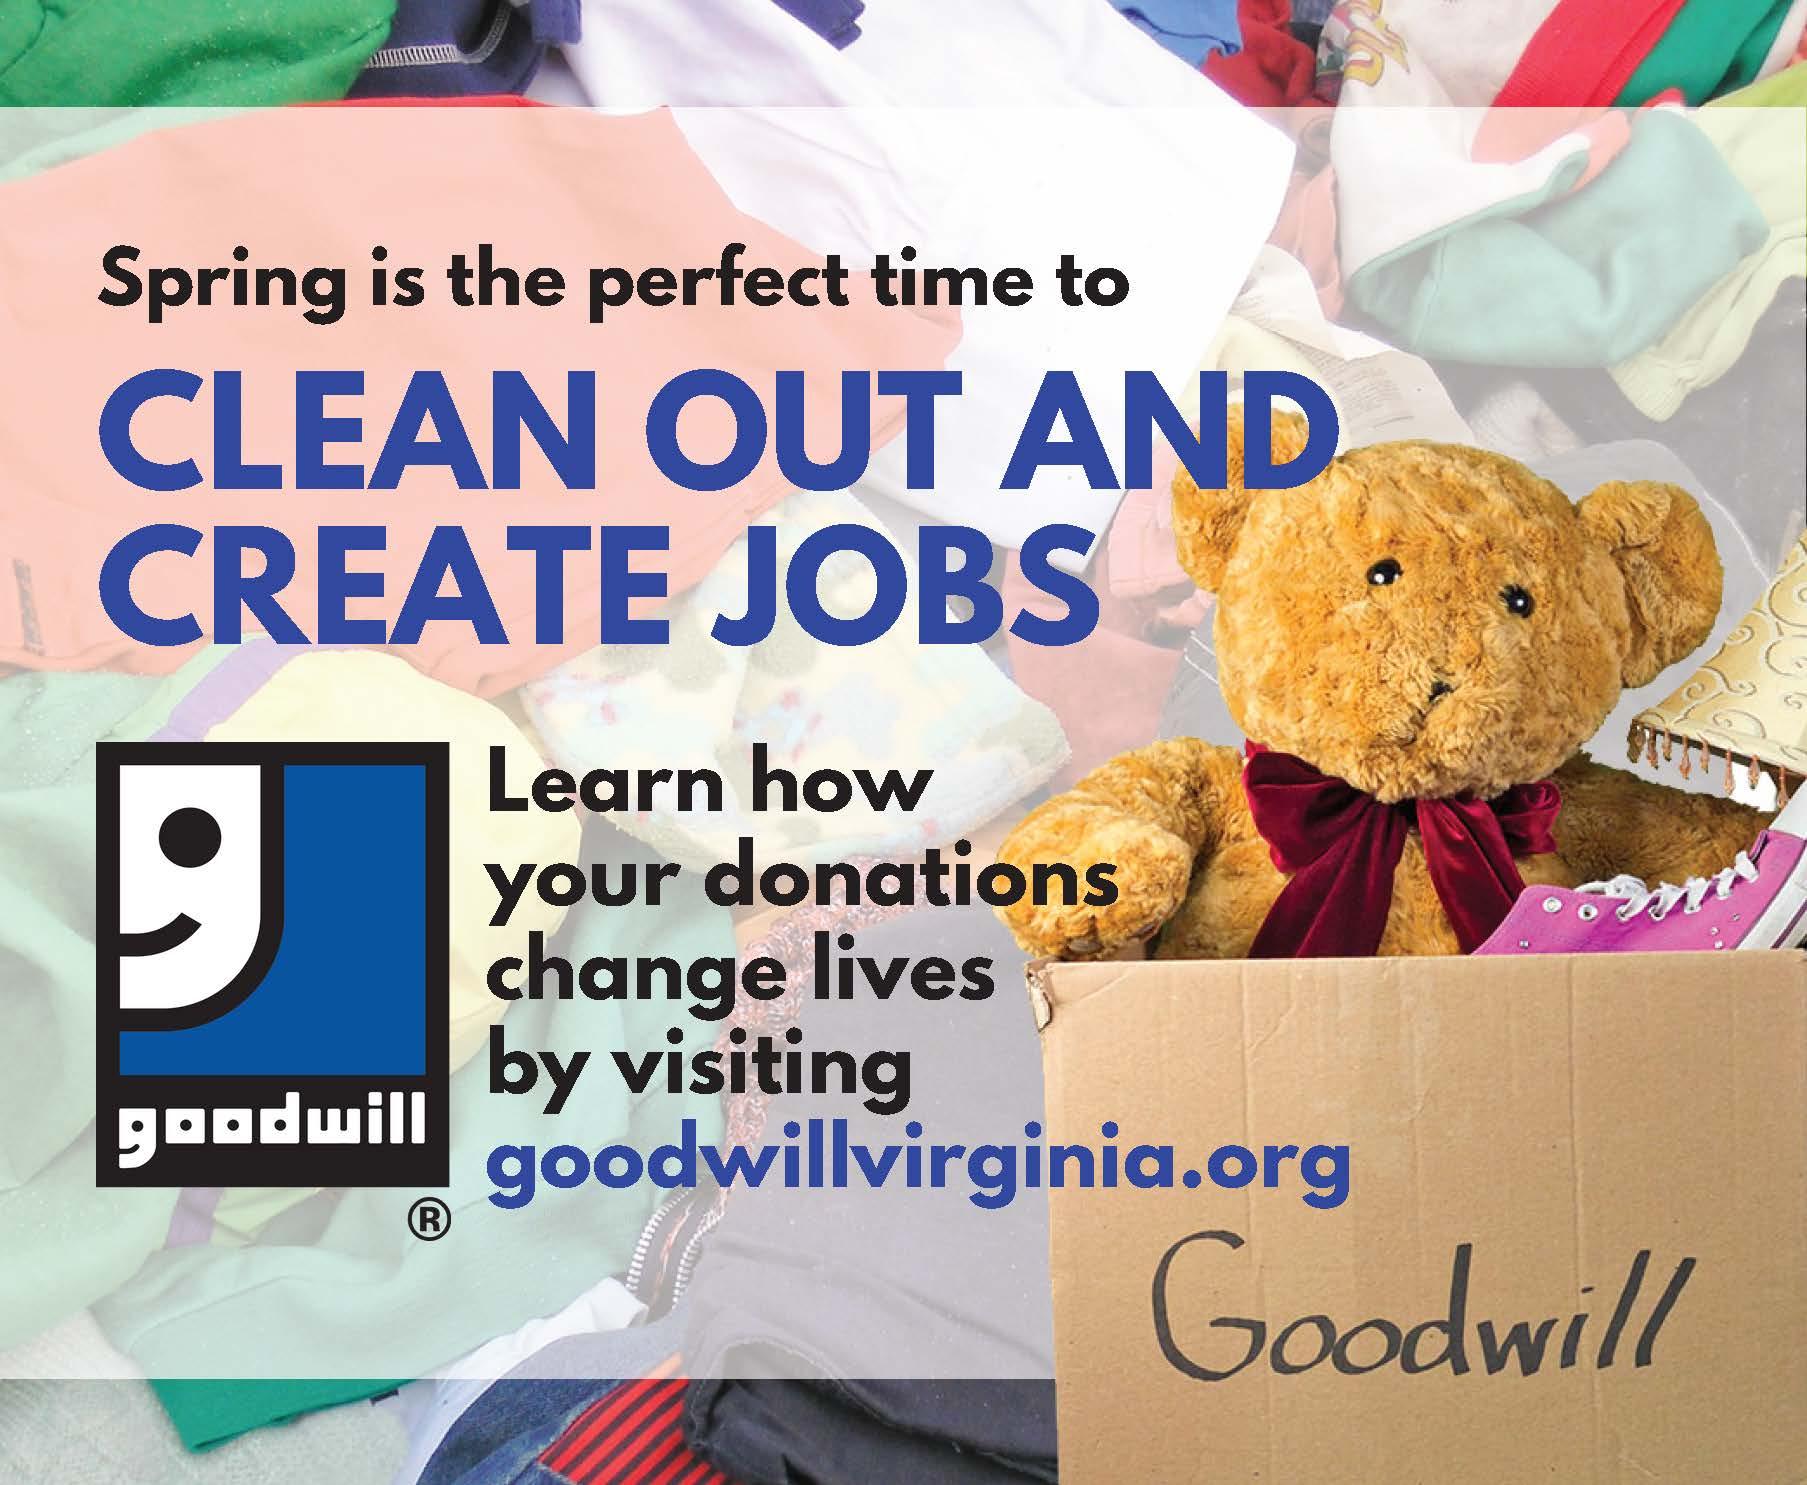 Goodwill Virginia